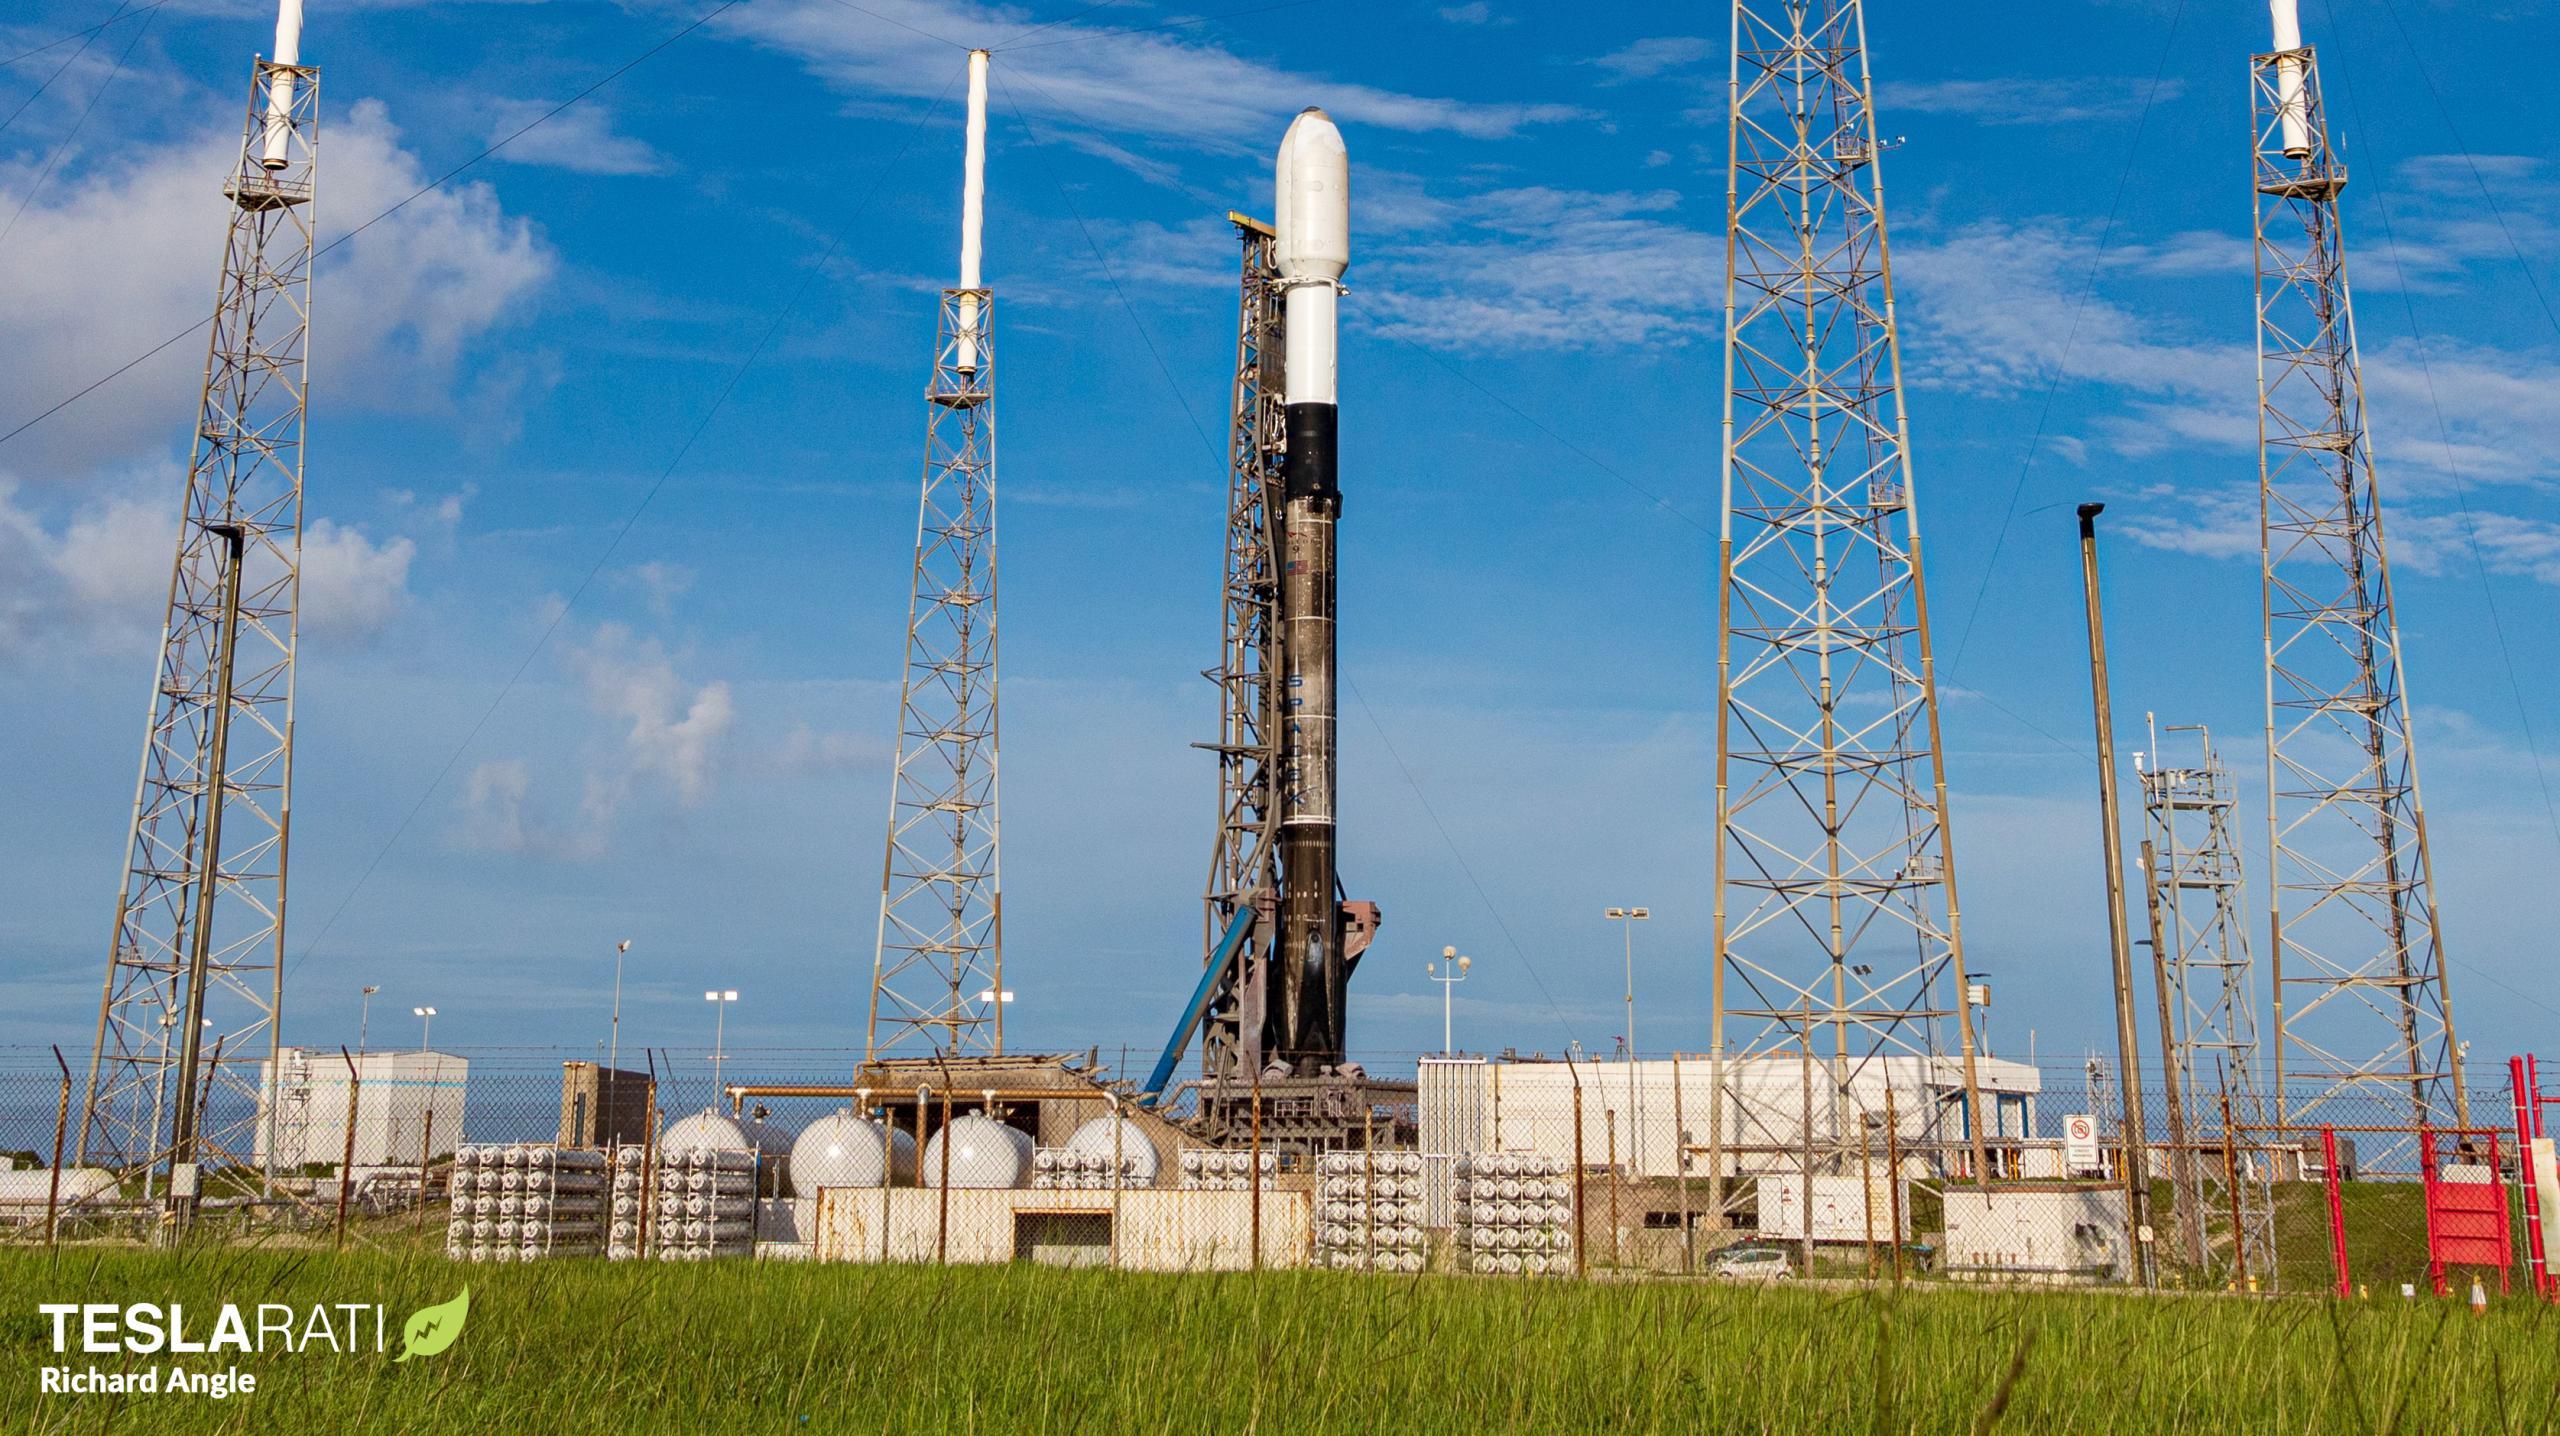 Transporter-2 Falcon 9 B1060 062921 (Richard Angle) prelaunch 2 crop 2 (c)